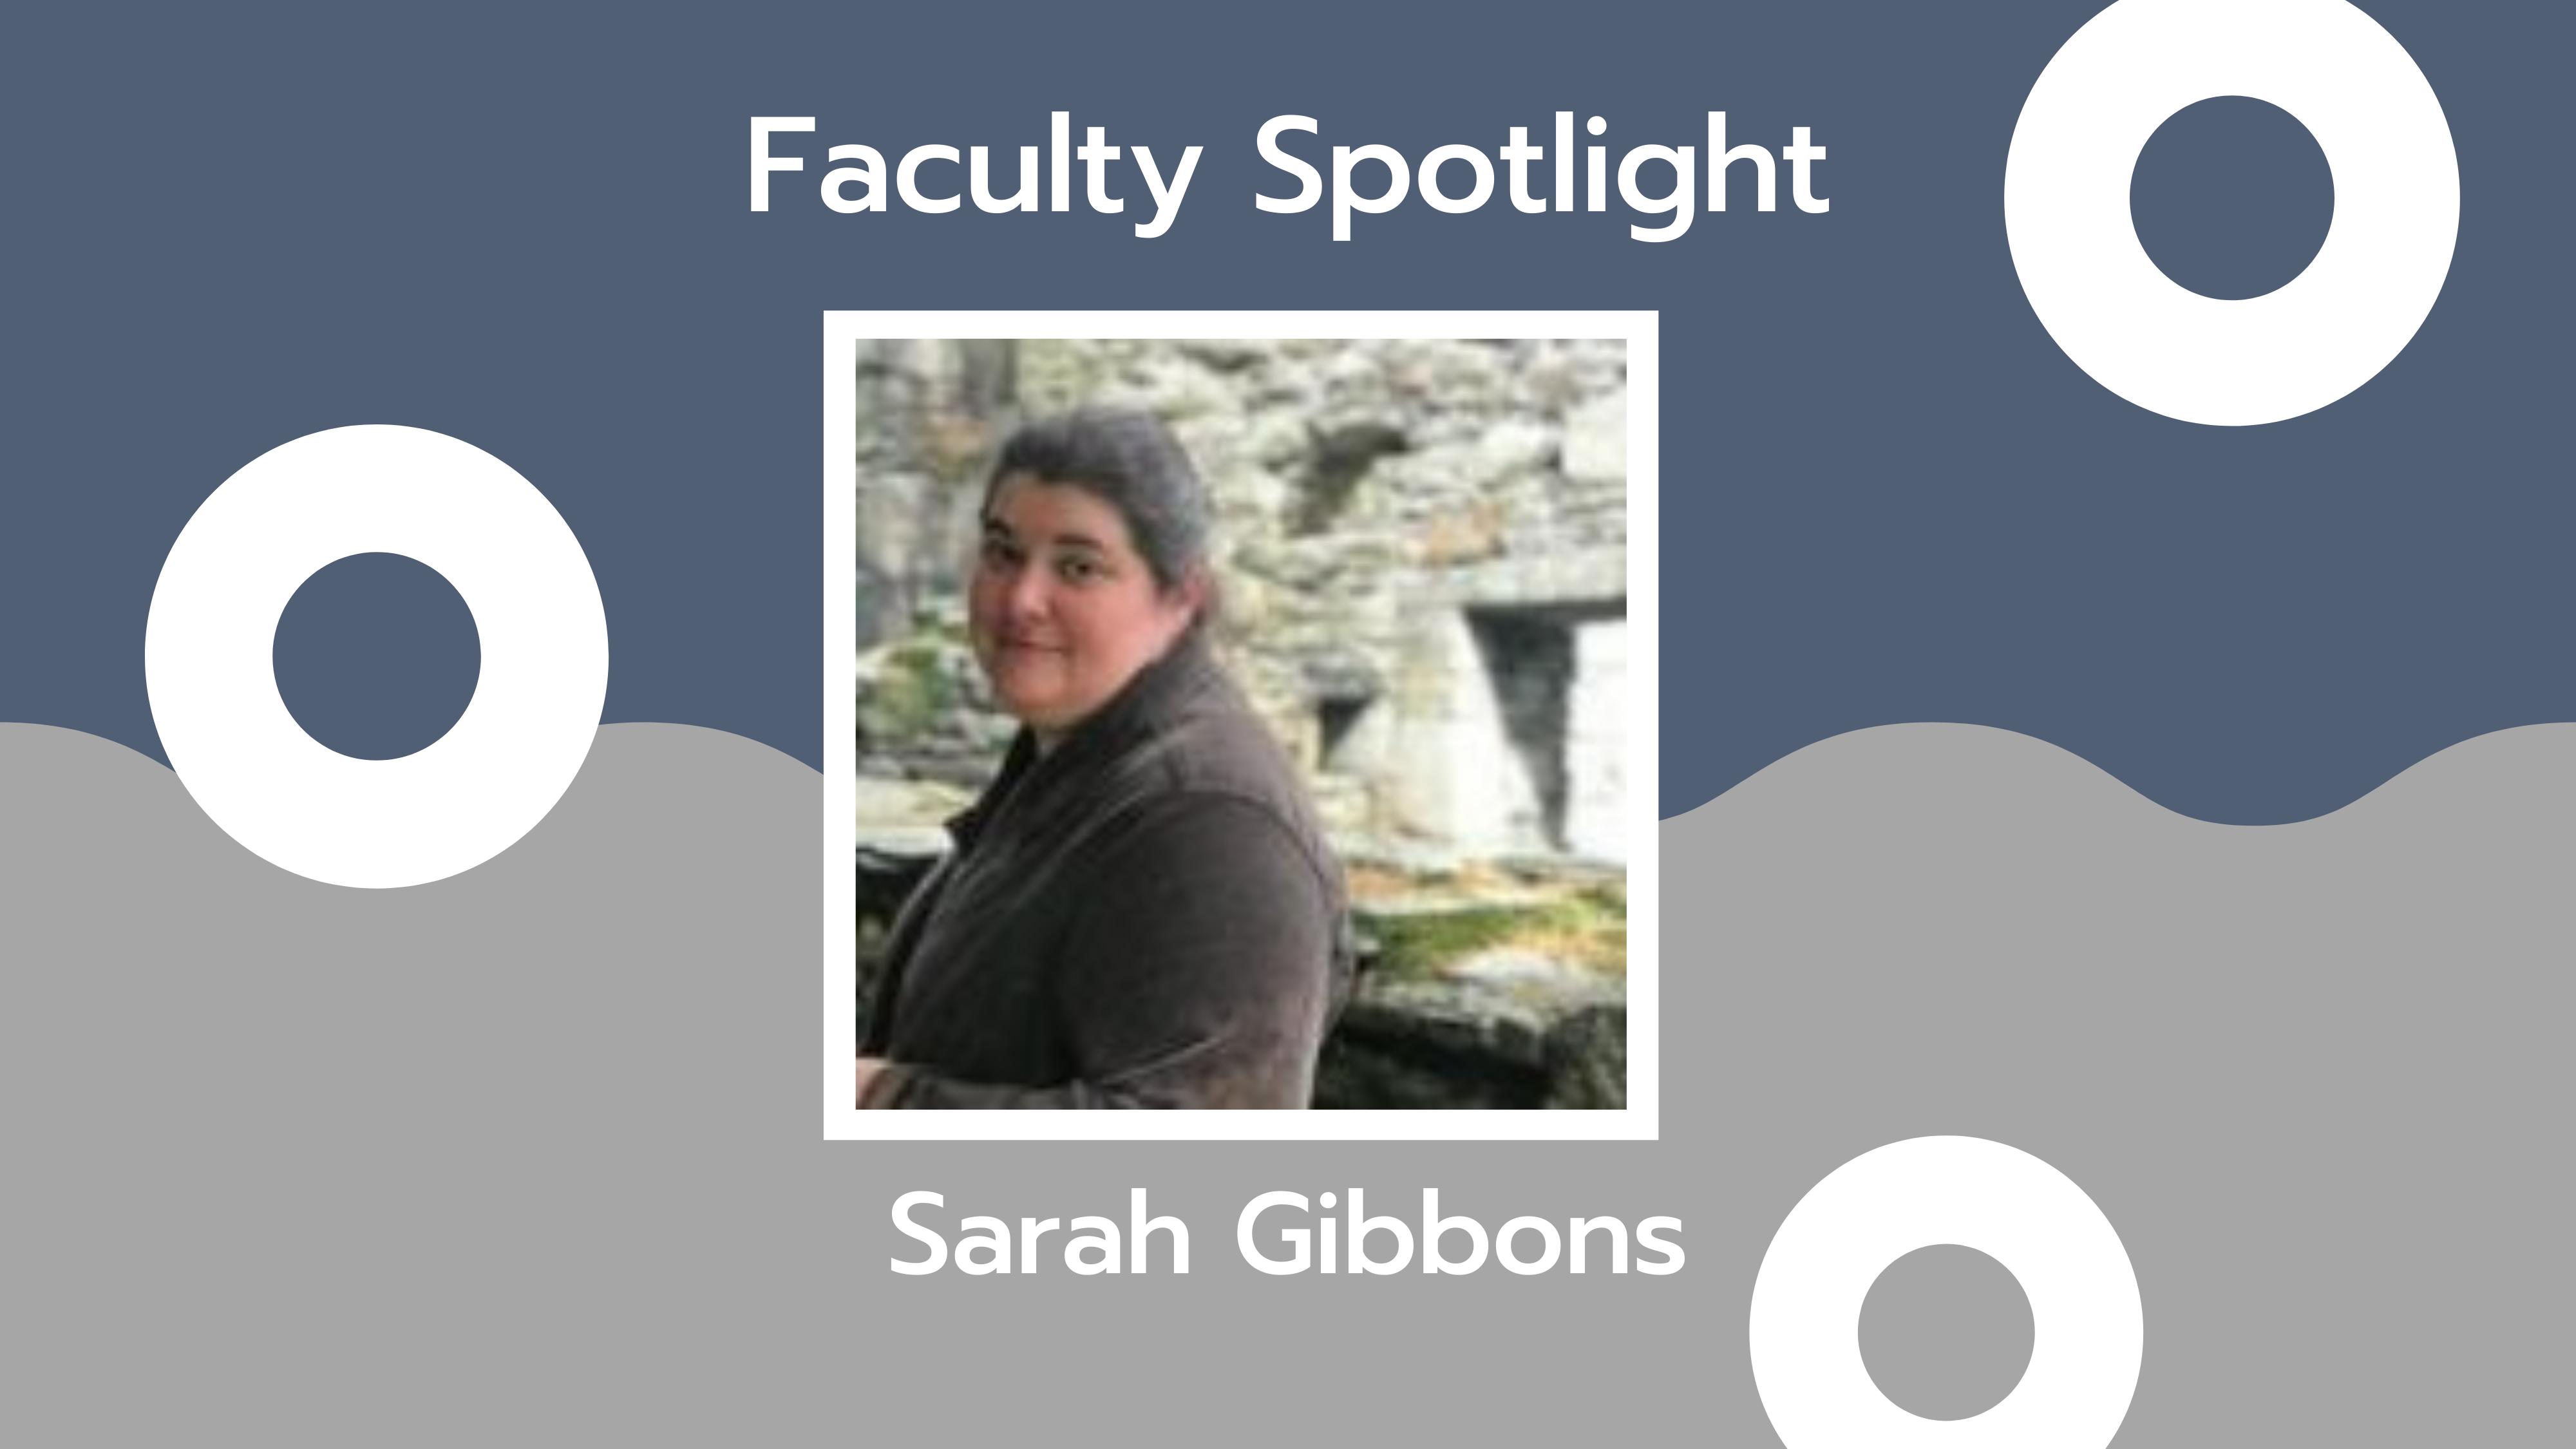 Faculty Spotlight: Sarah Gibbons